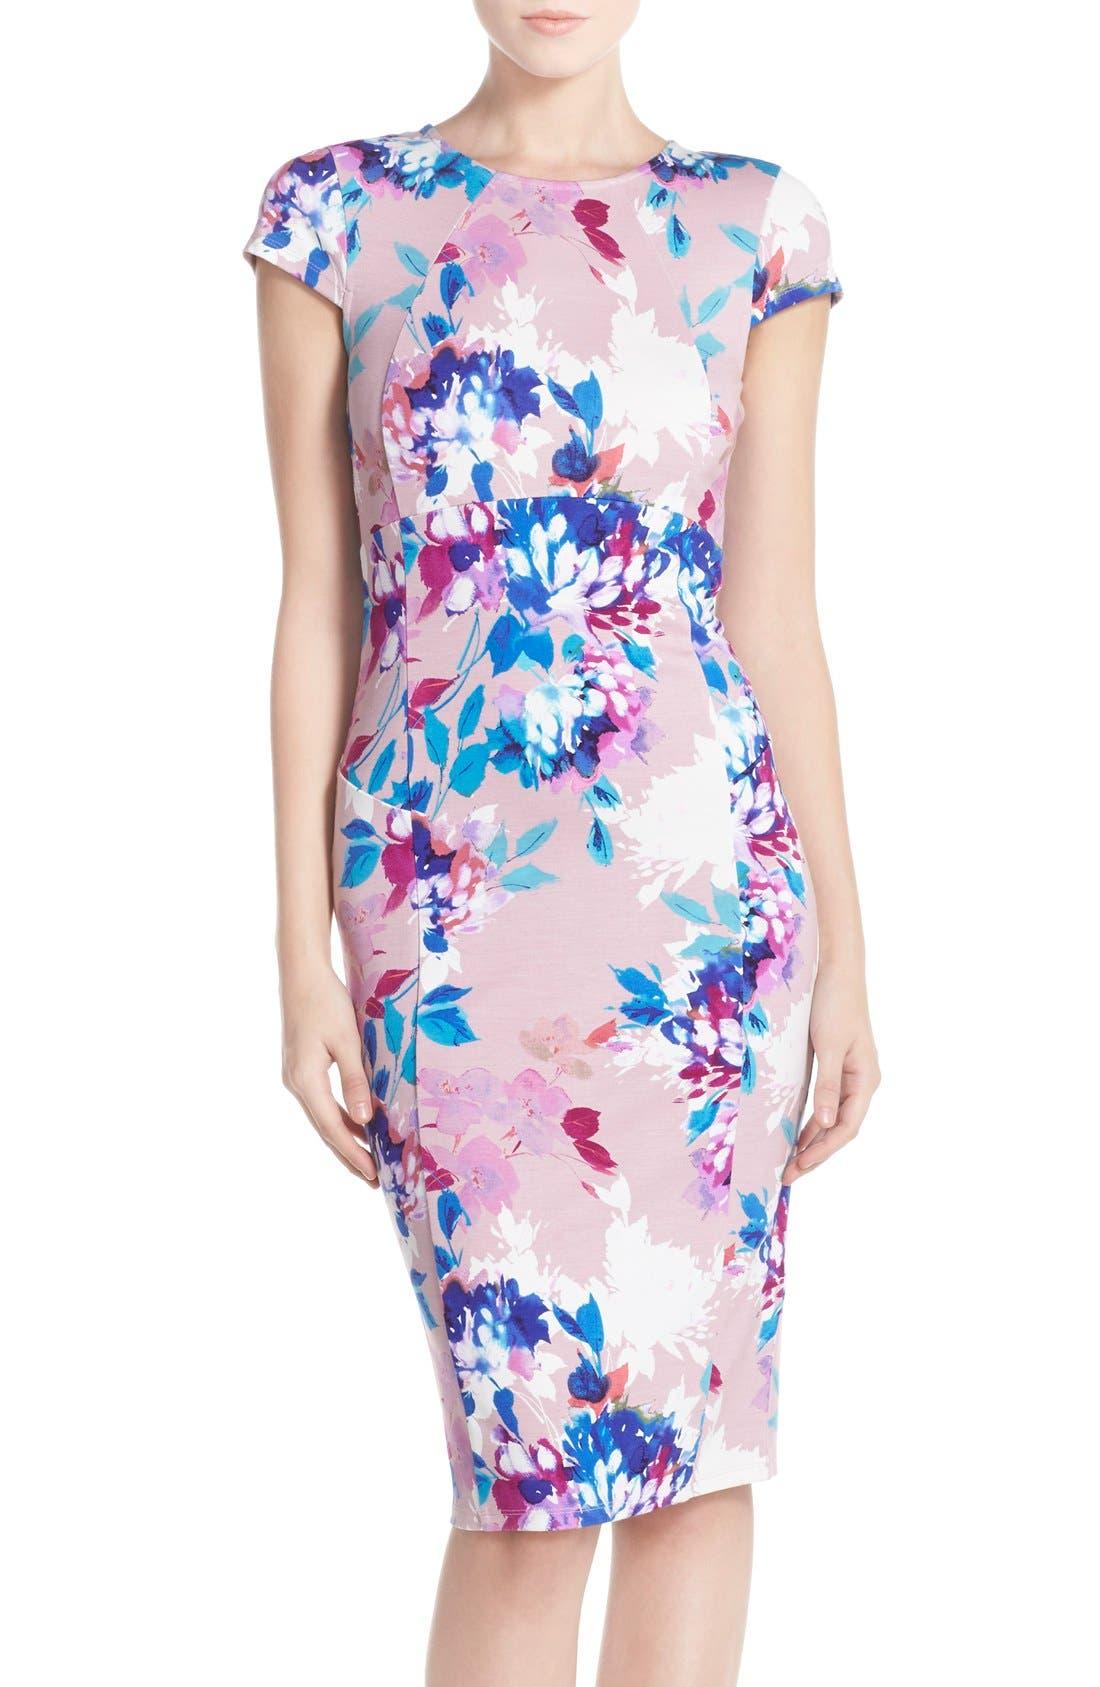 Main Image - Felicity & Coco Floral Ponte Sheath Dress (Regular & Petite) (Nordstrom Exclusive)